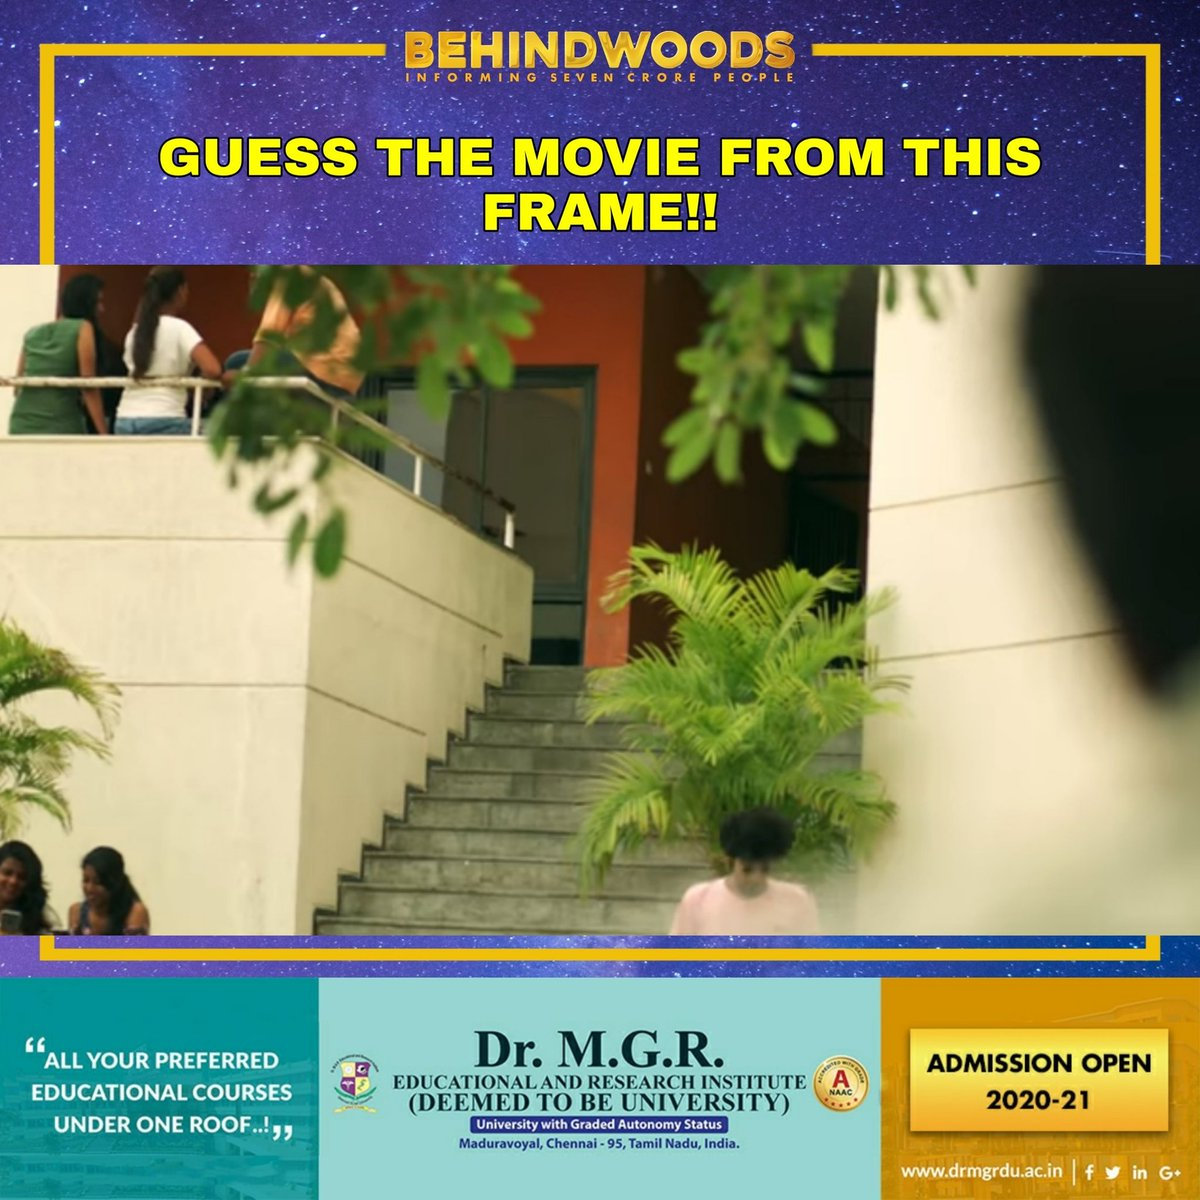 Enna padam ithu?🎬🎥  #Frame #Movie #QuarantineTimepass #BehindwoodsPuzzle https://t.co/c7qXOlN3og